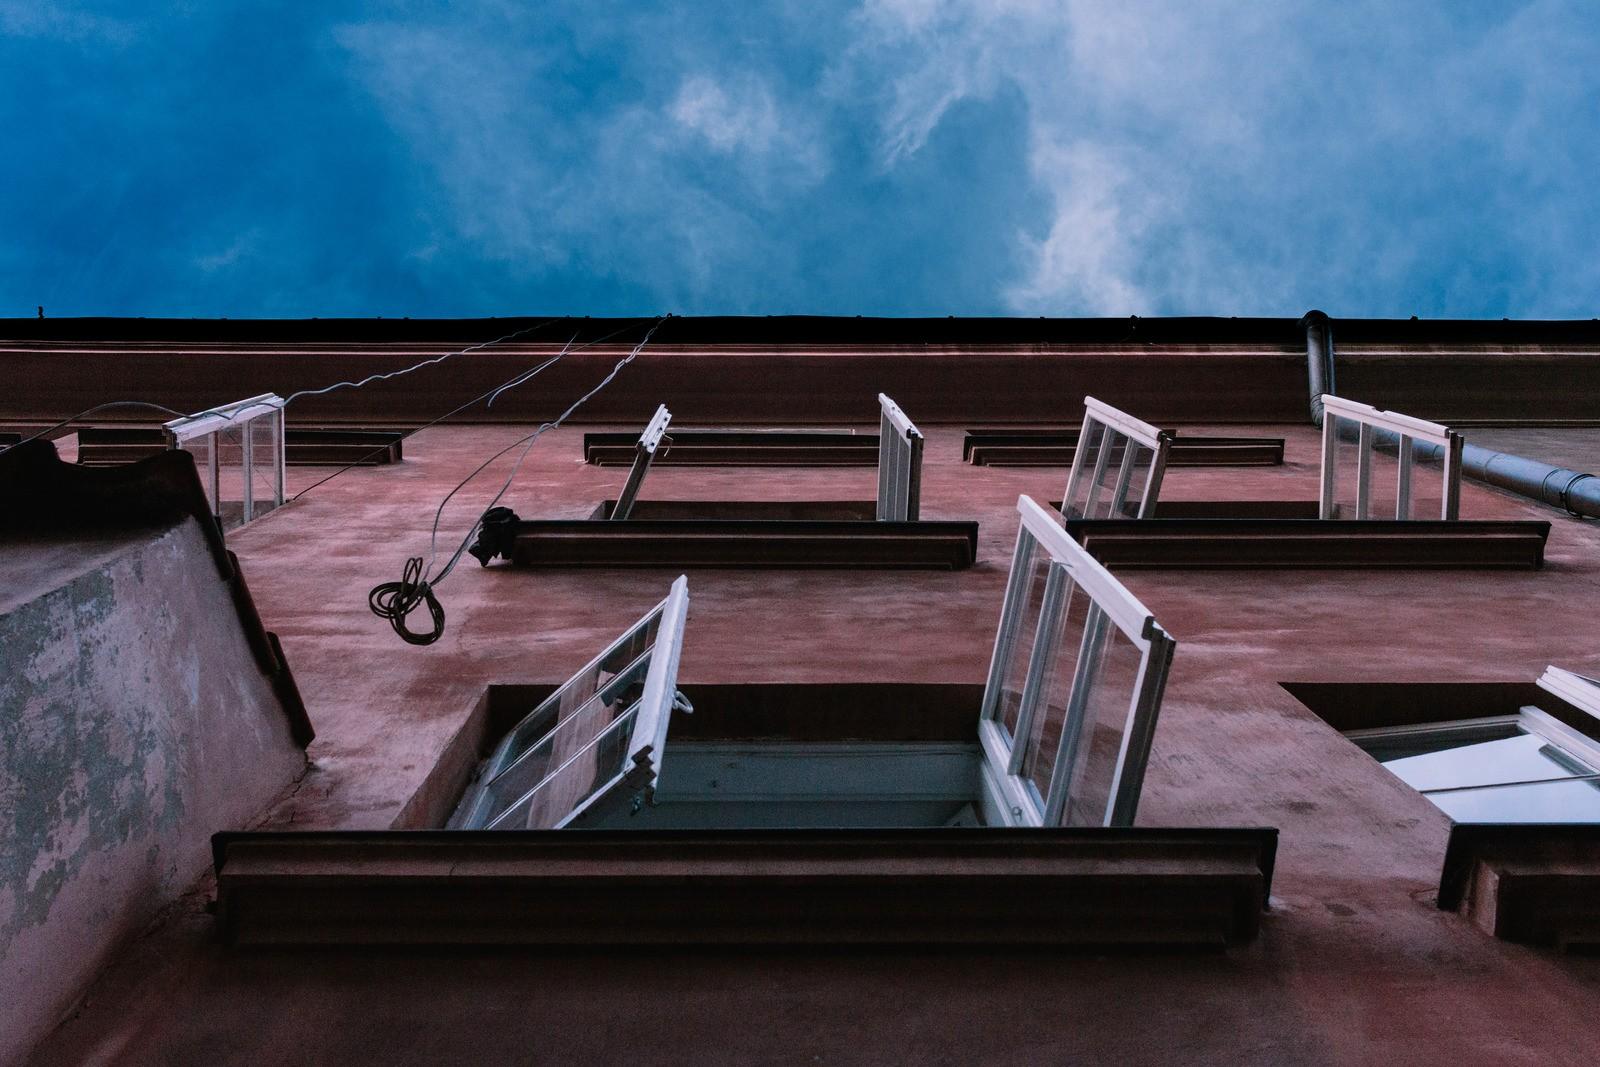 nauka hiszpańskiego tirar la casa por la ventana